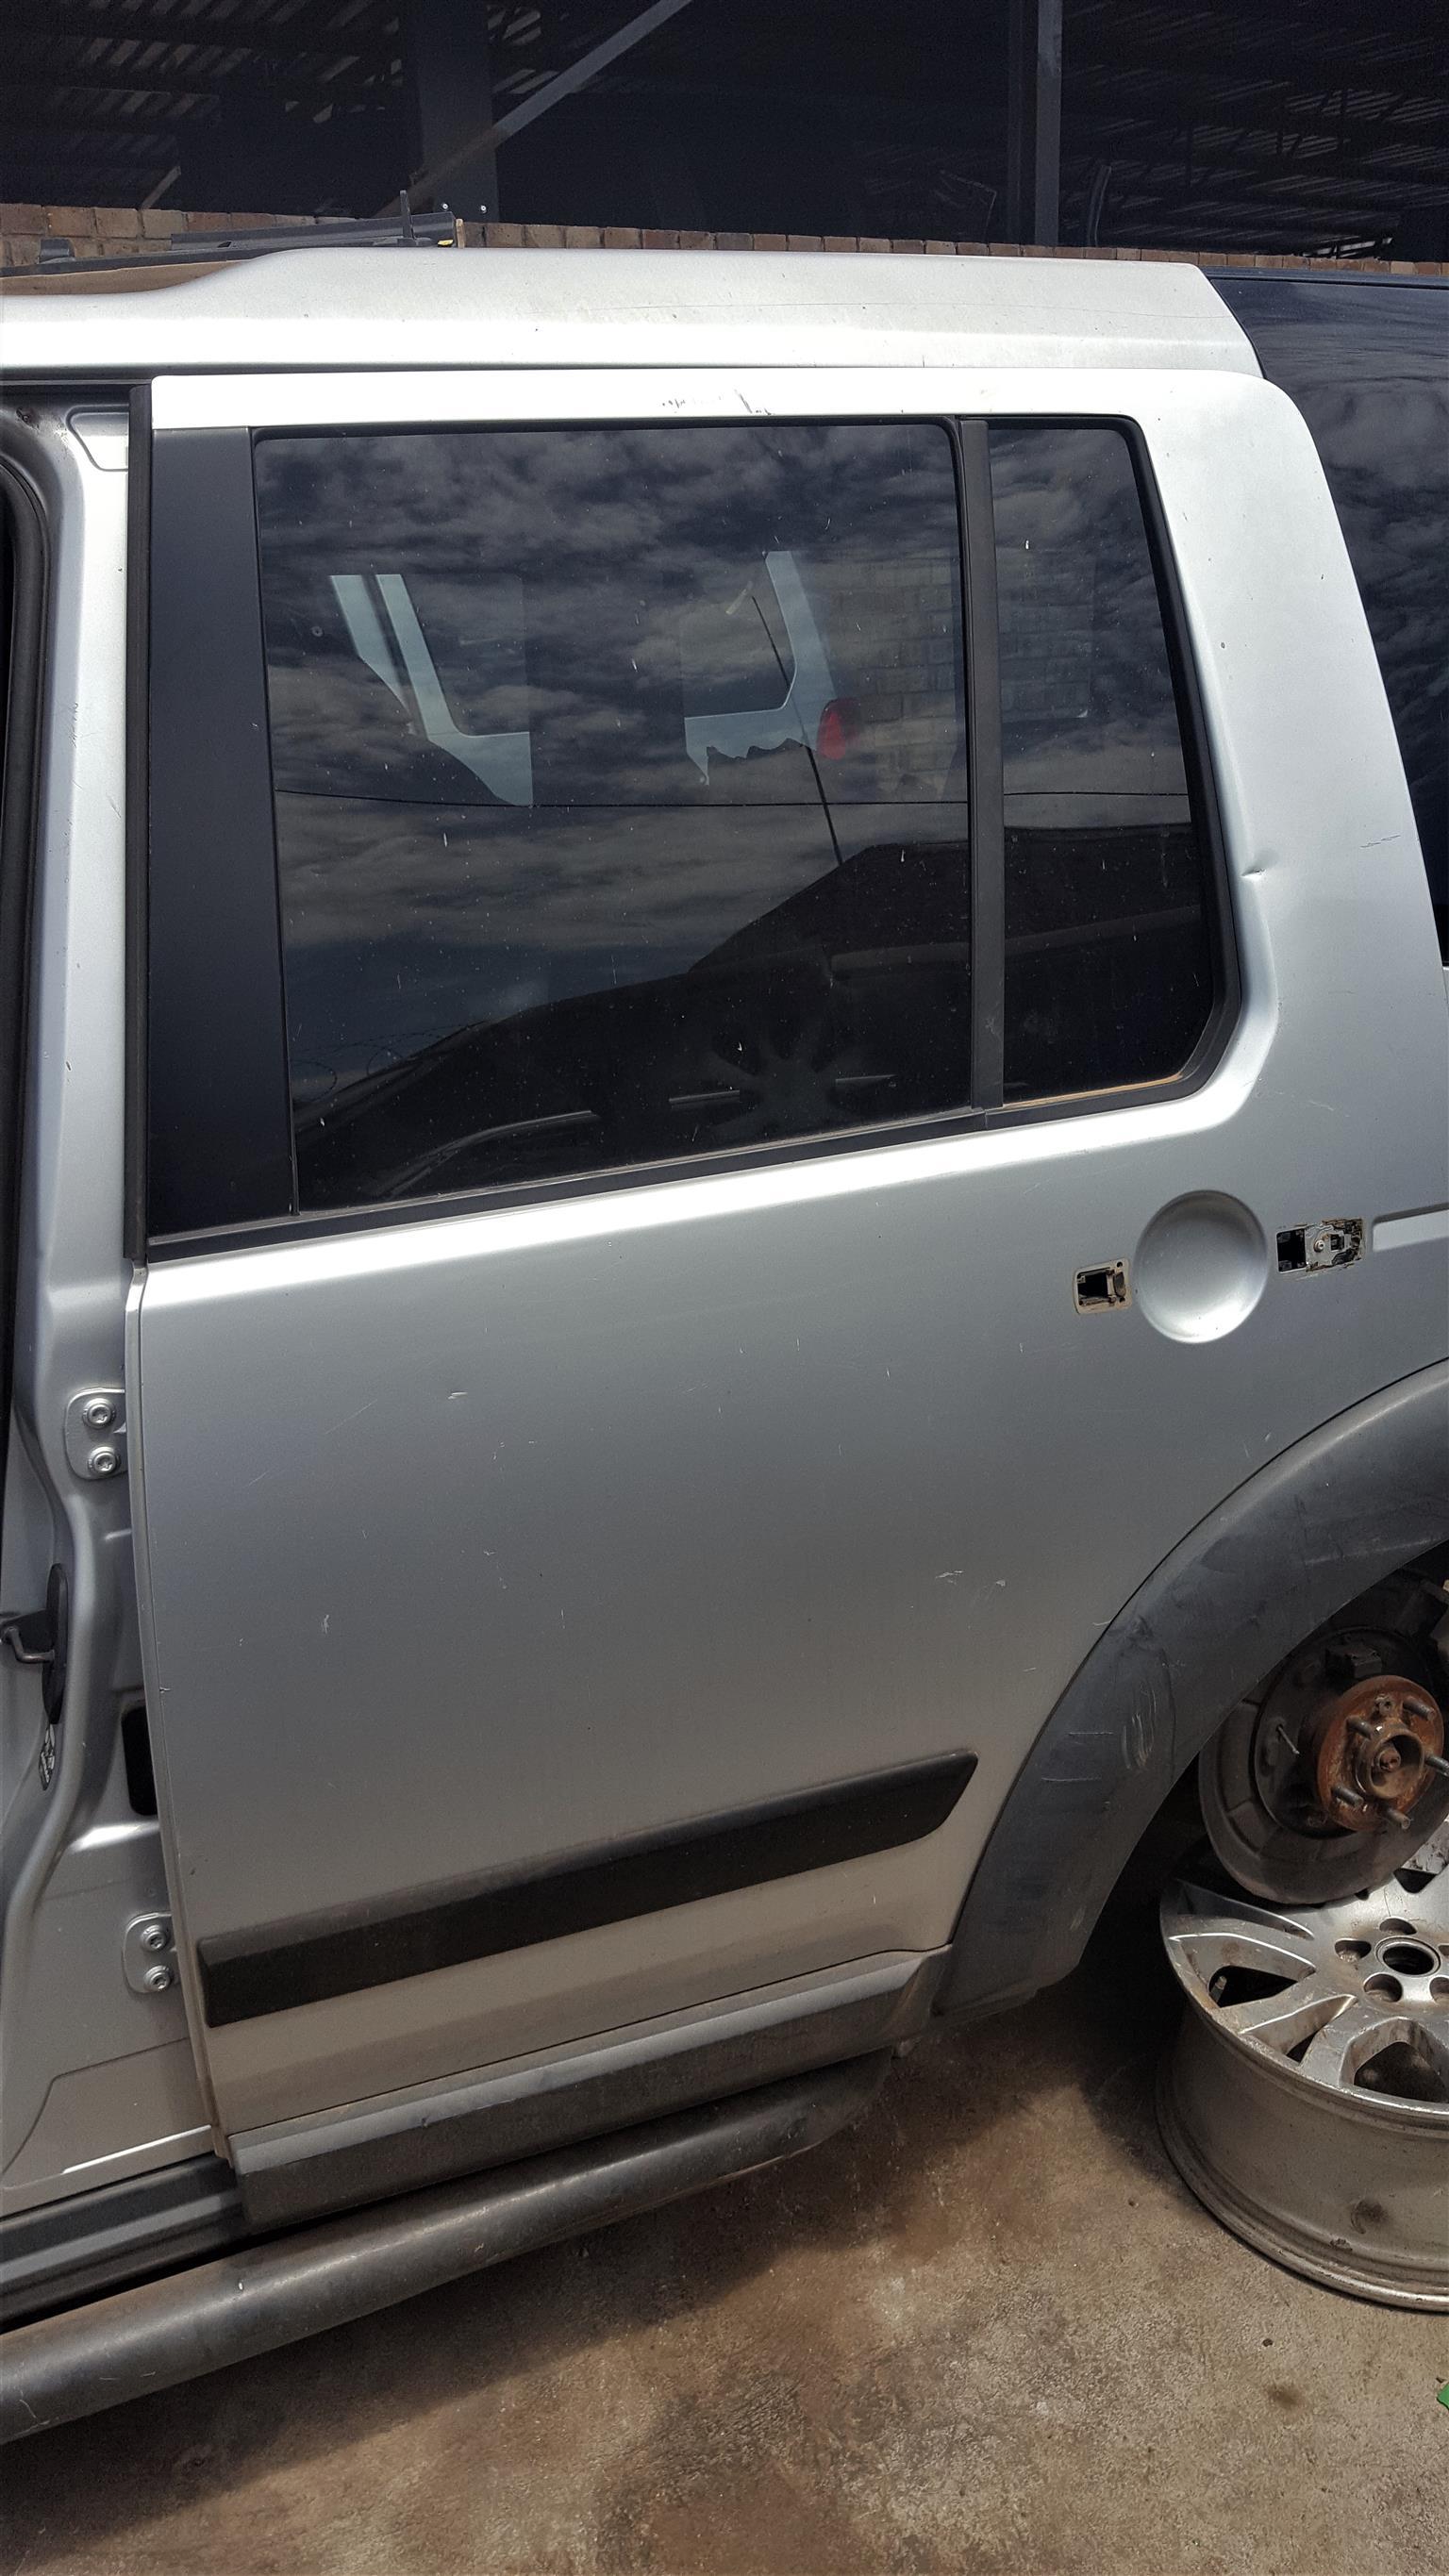 Rear Doors for Land Rover Discovery 3, 4, Freelander, Range Rover | Auto Ezi